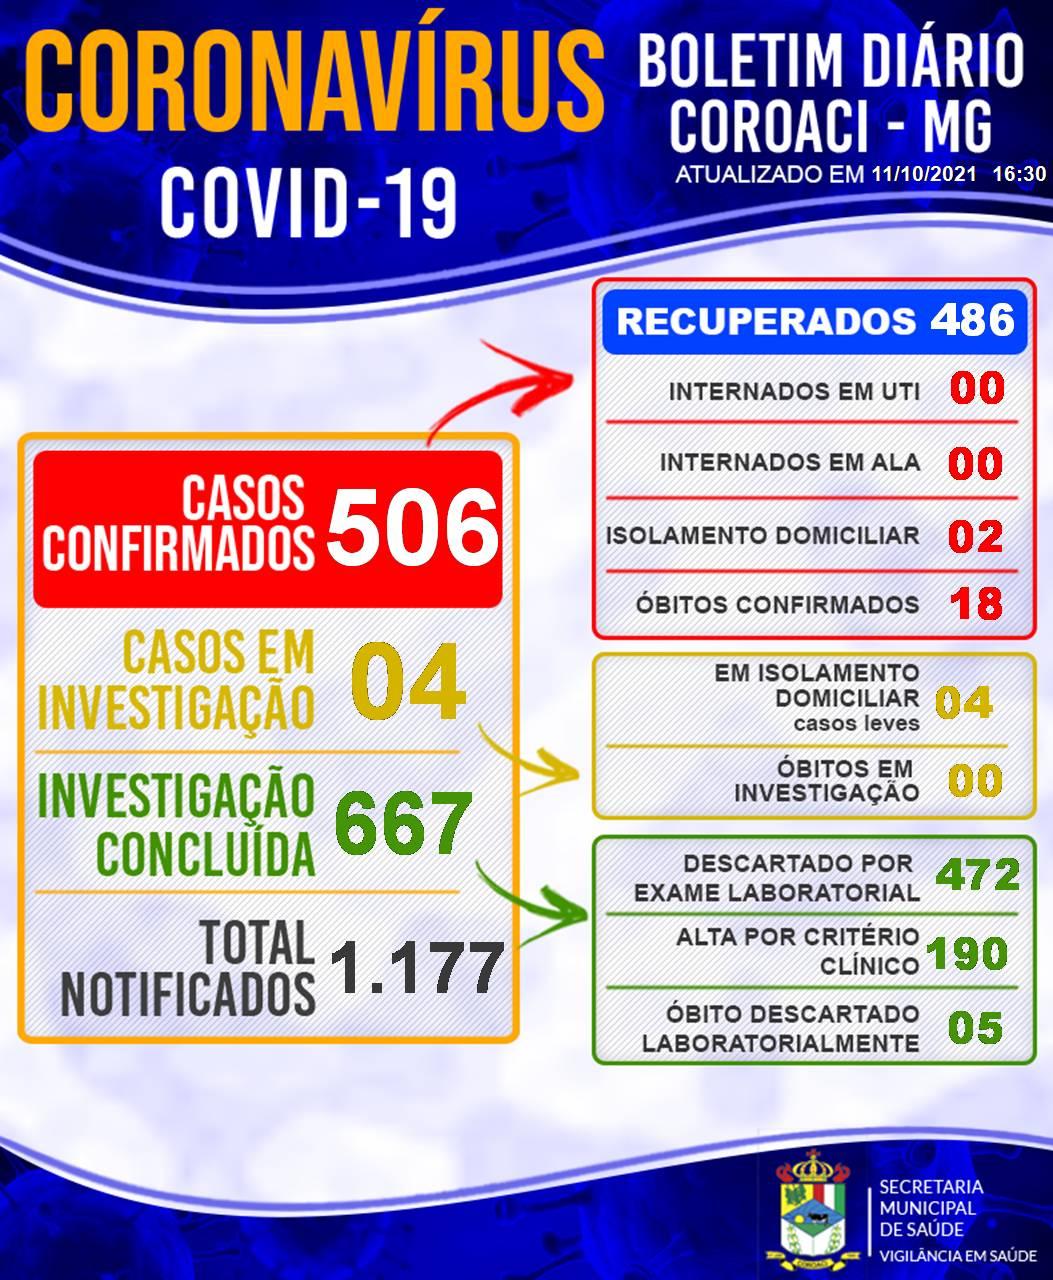 BOLETIM INFORMATIVO OFICIAL SOBRE O CORONAVÍRUS 11/1...